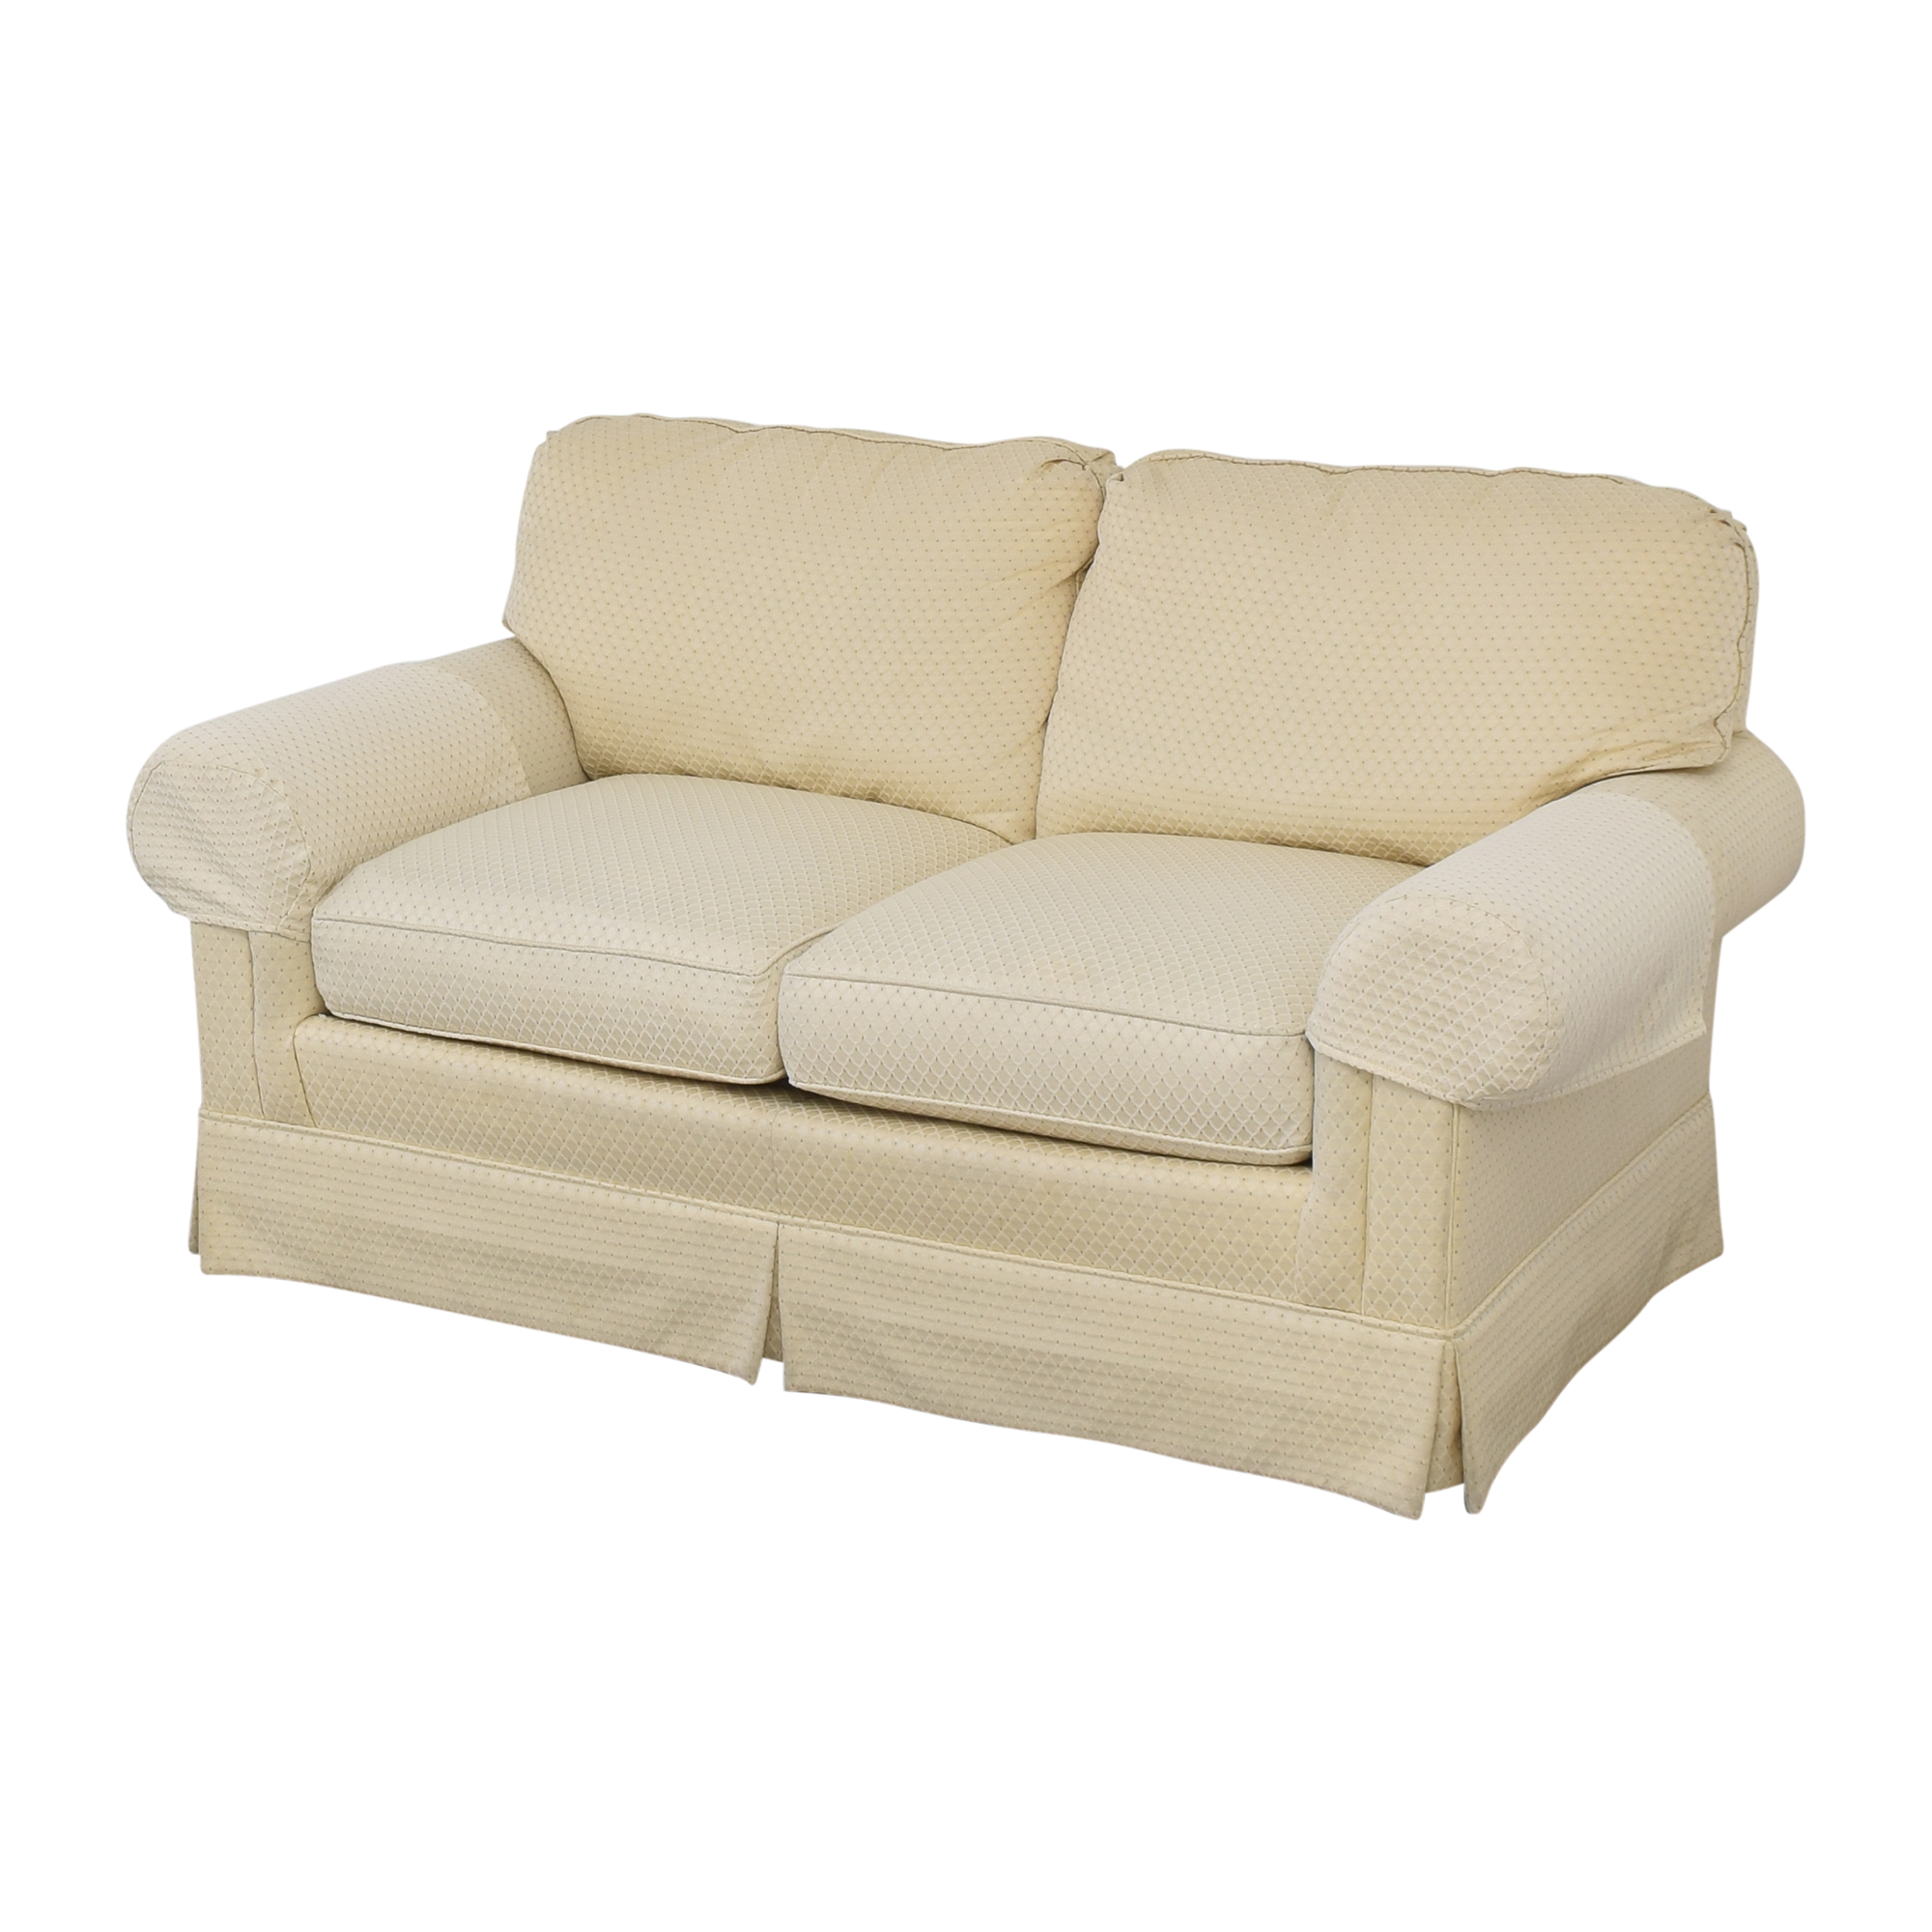 Thomasville Two Cushion Loveseat / Sofas